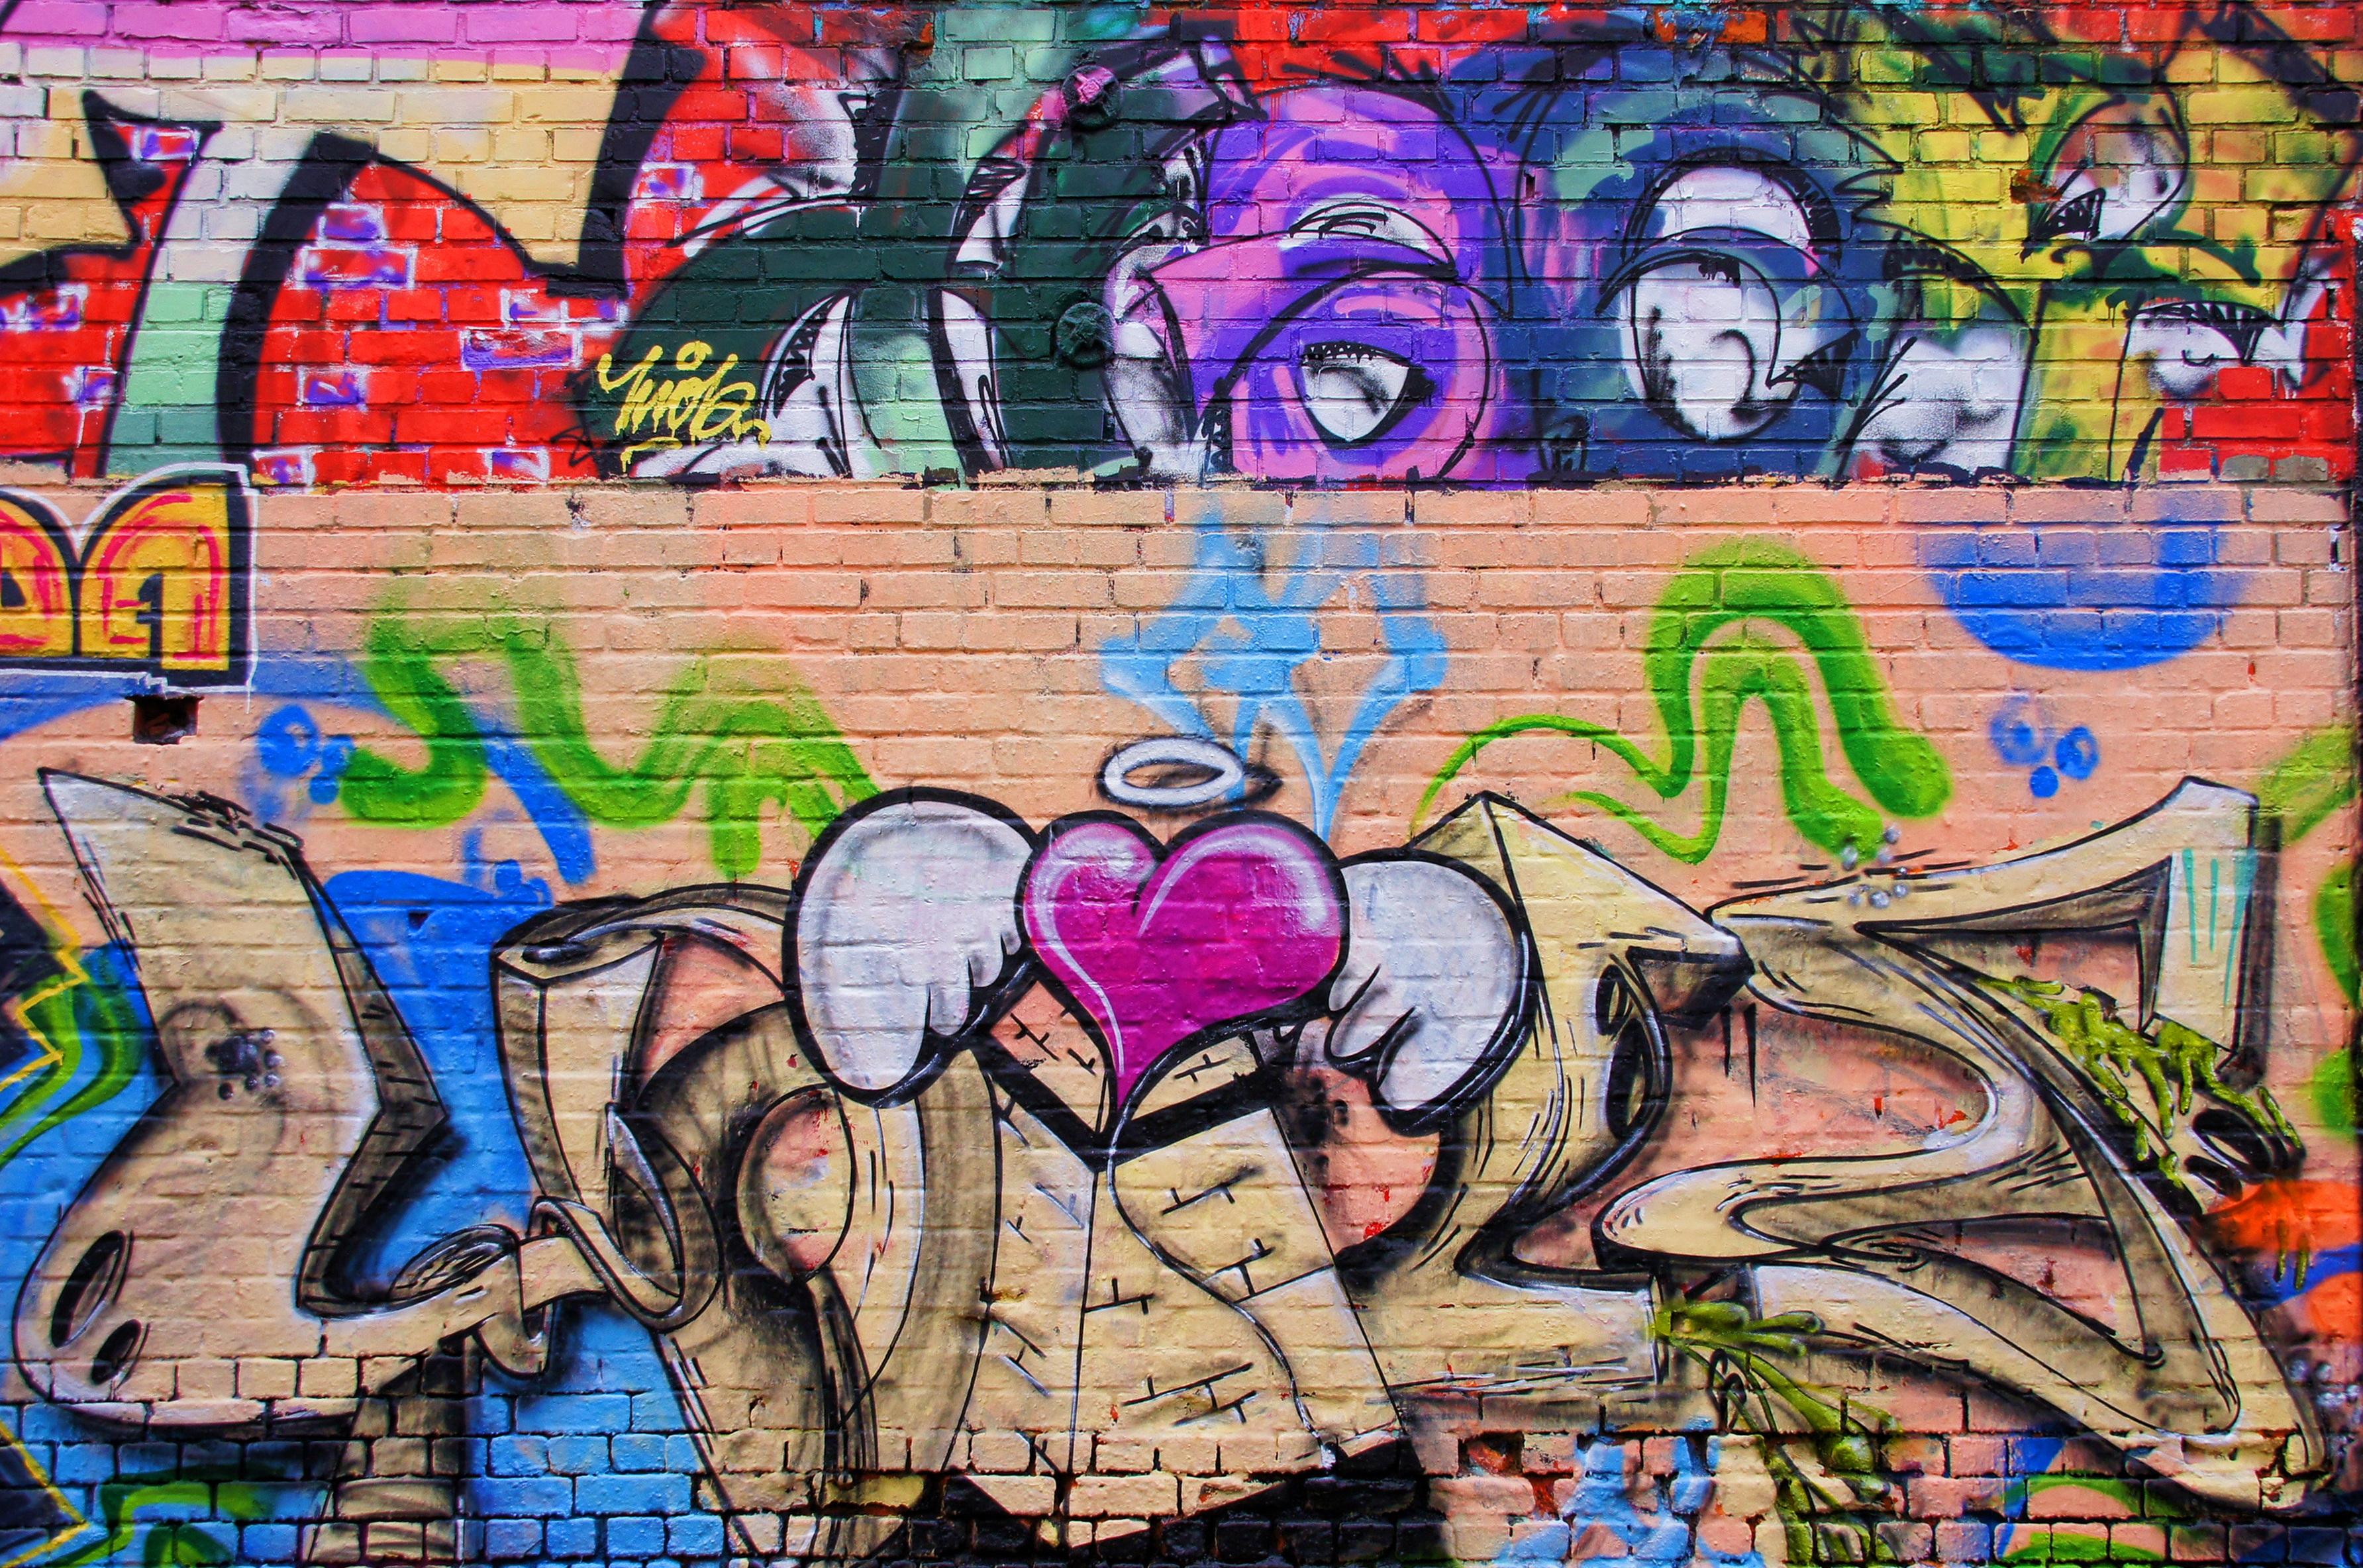 Free Images Spray Graffiti Street Art Mural Leipzig Wall